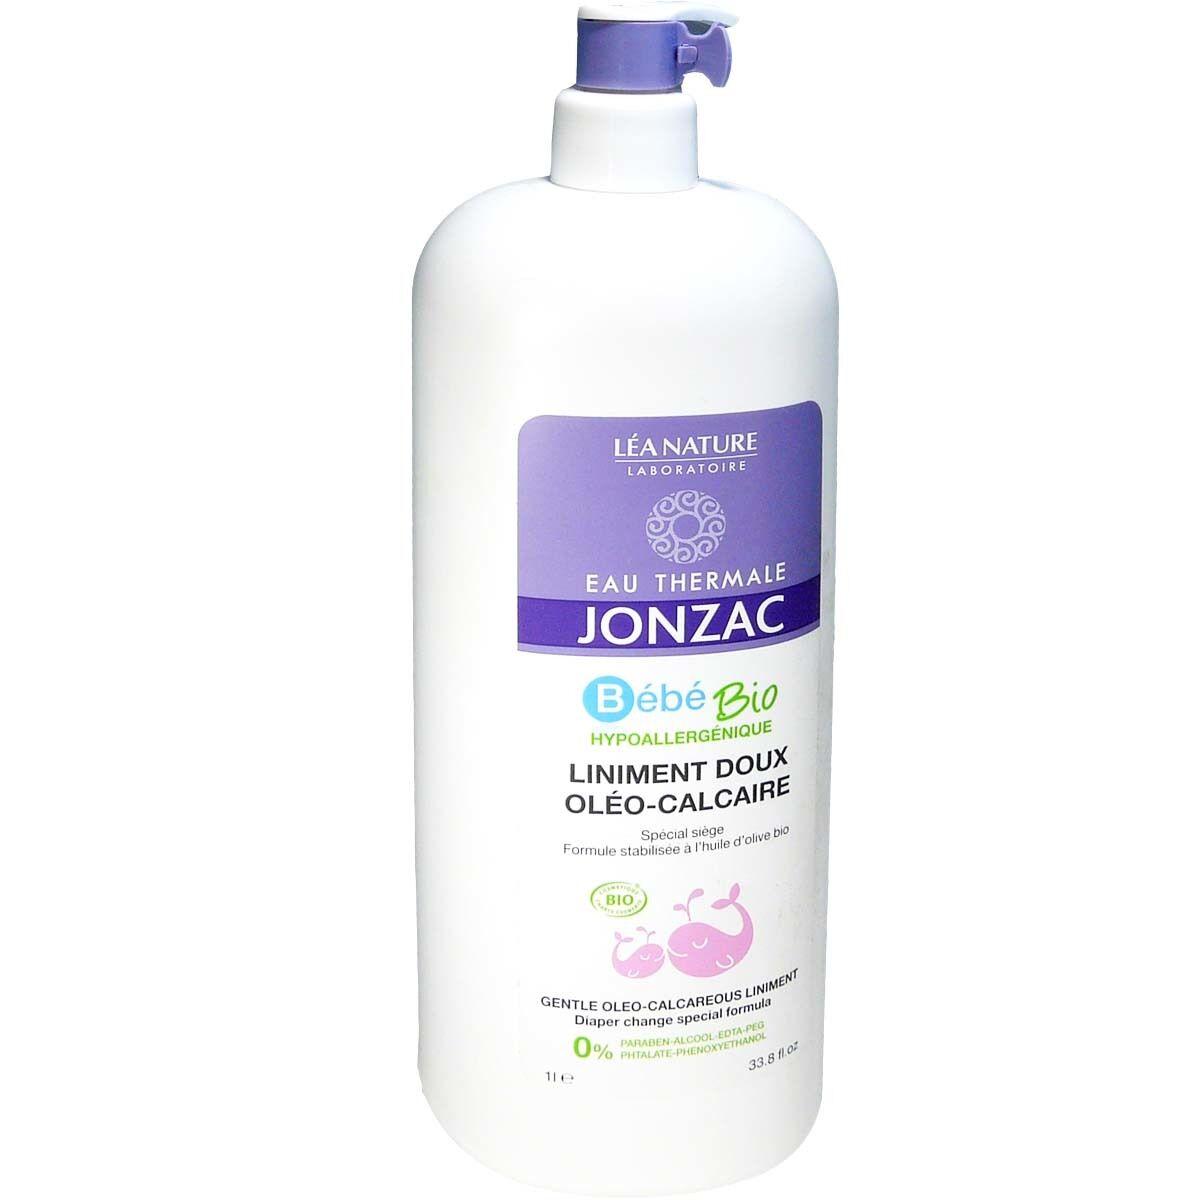 Jonzac bebe bio liniment doux oleo-calcaire 1l